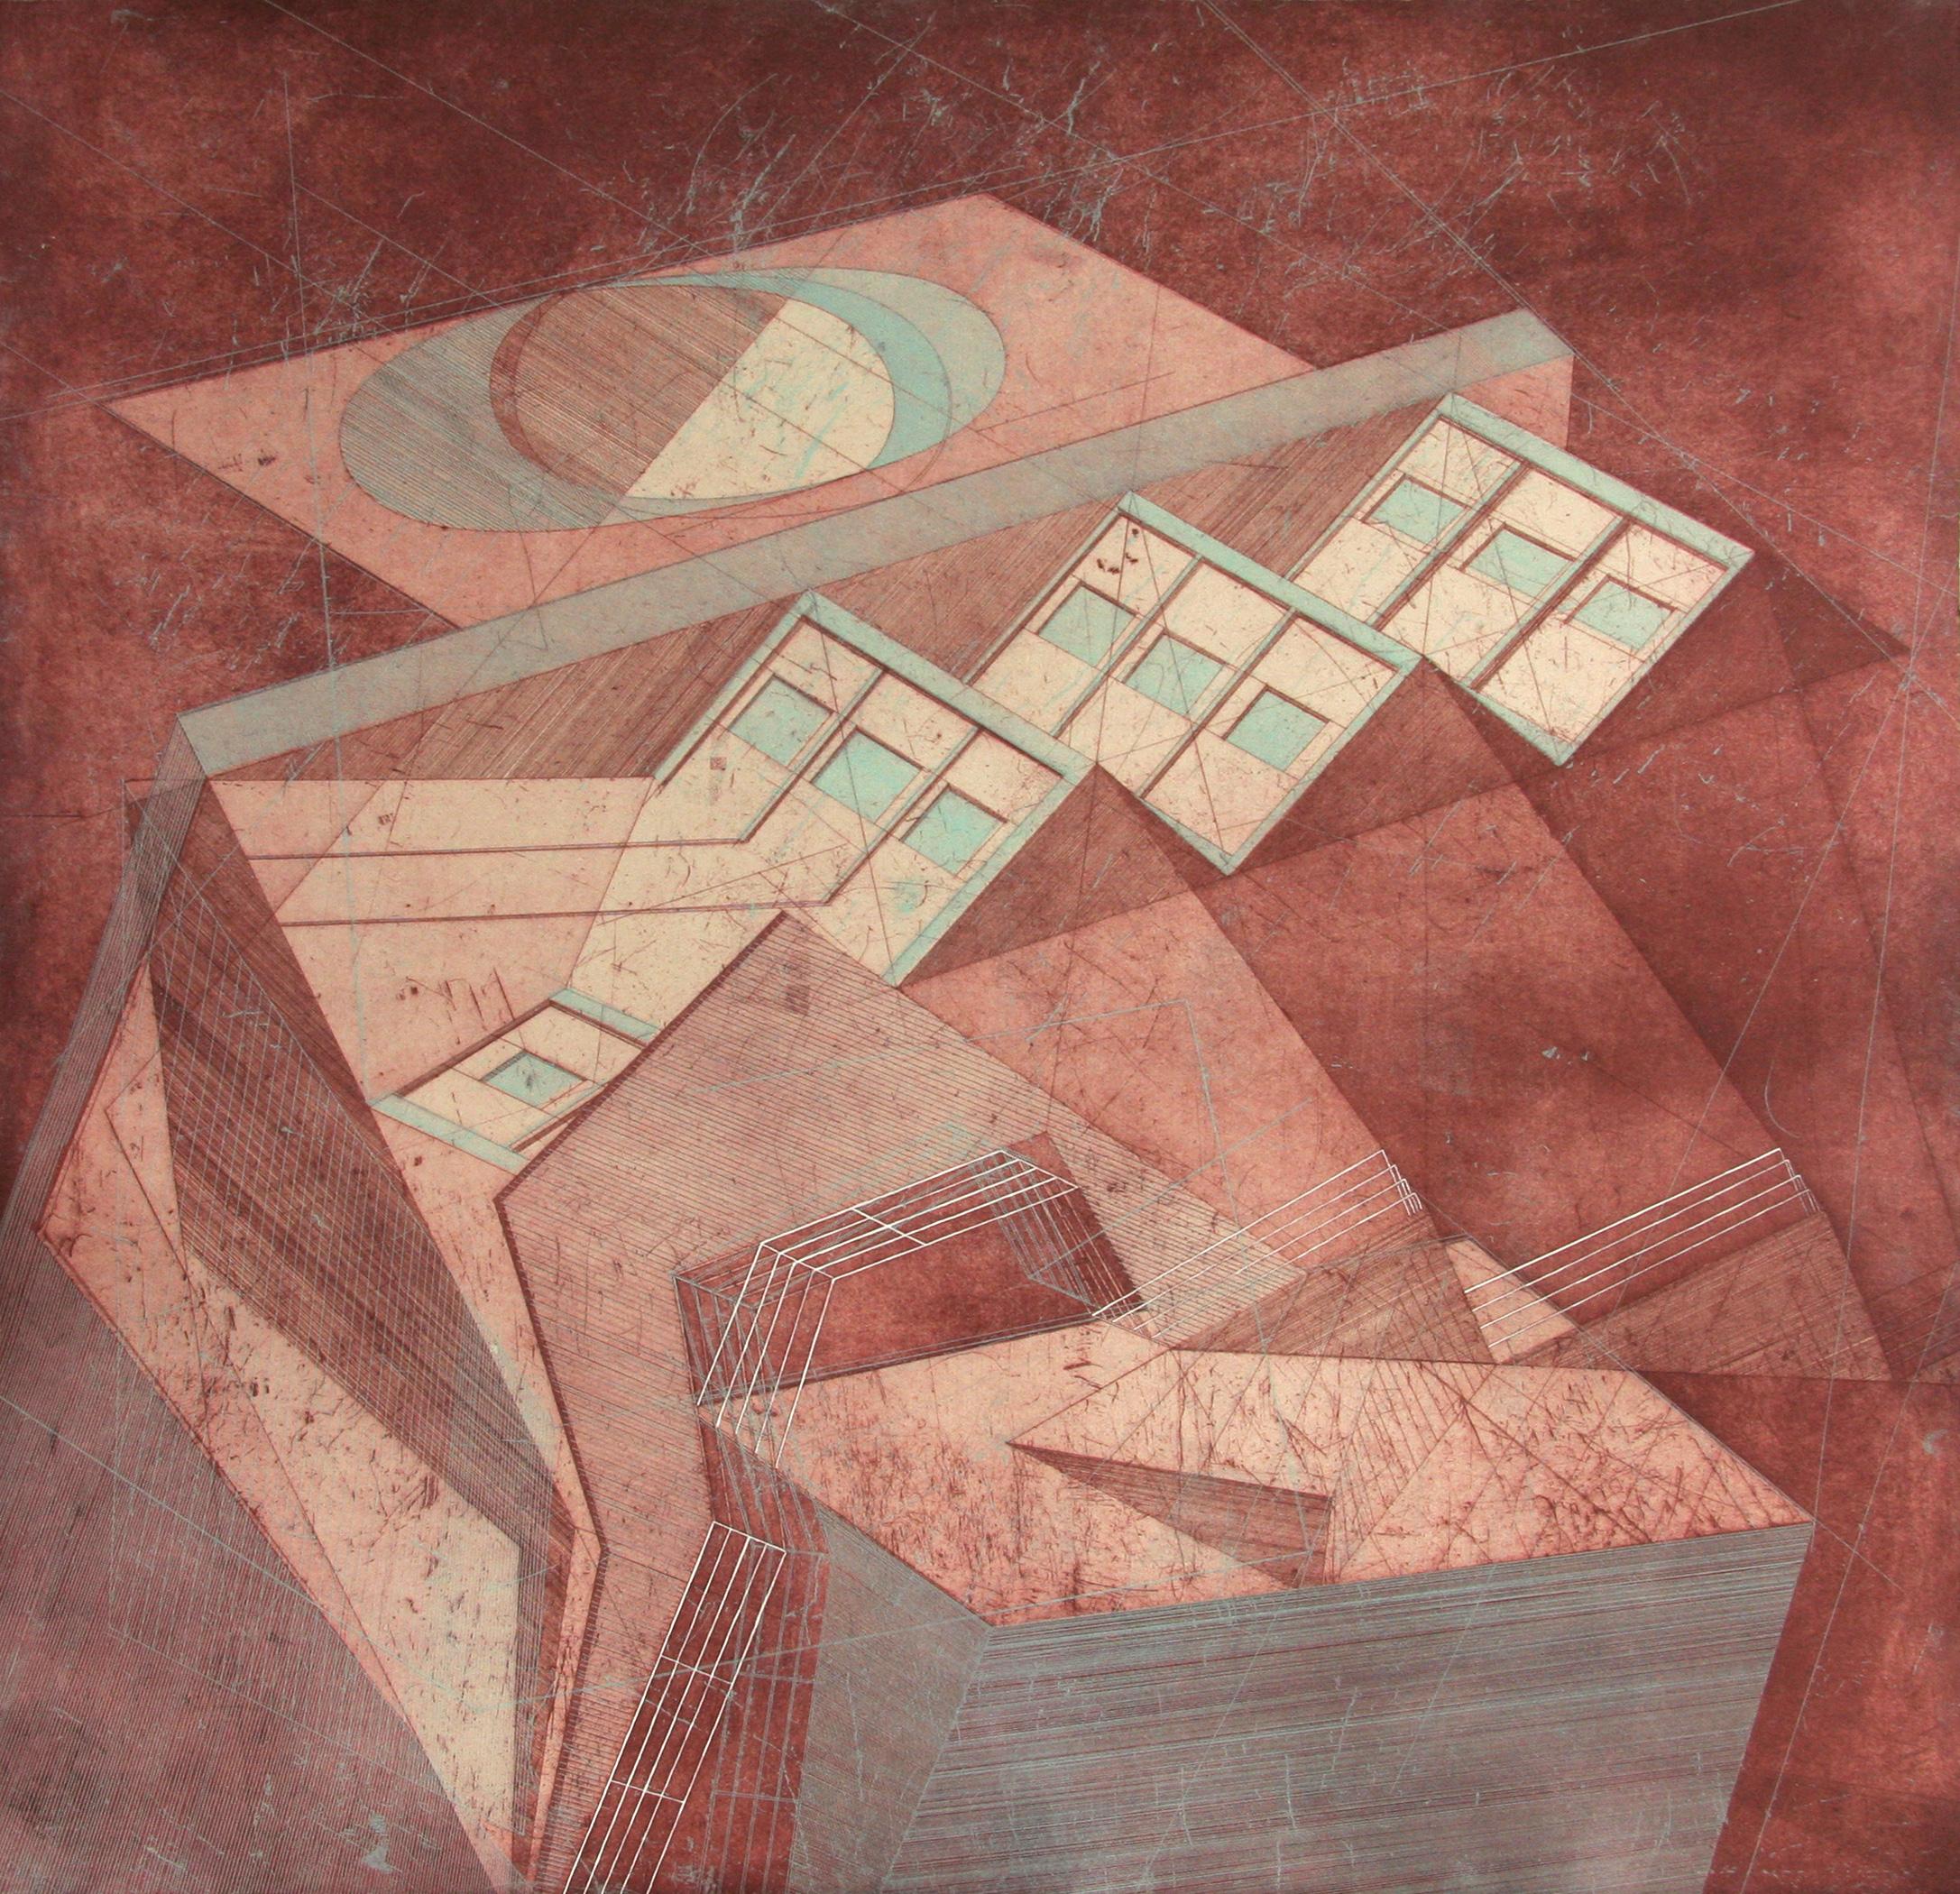 Bronwen-Sleigh,-'Kiyembe-Lane',-76-x-76cm,-hand-coloured-etching-(ed.-25),-2017.jpg